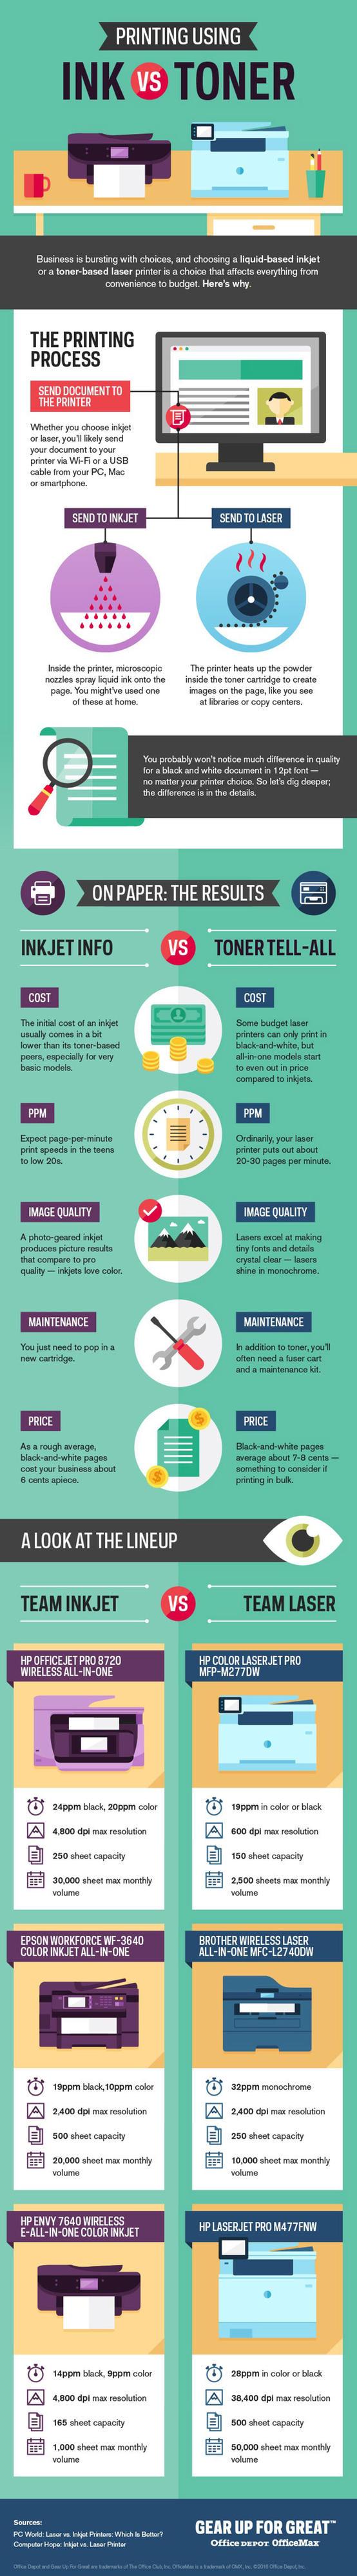 Printing-Using-Ink-Vs-Toner-Infographic